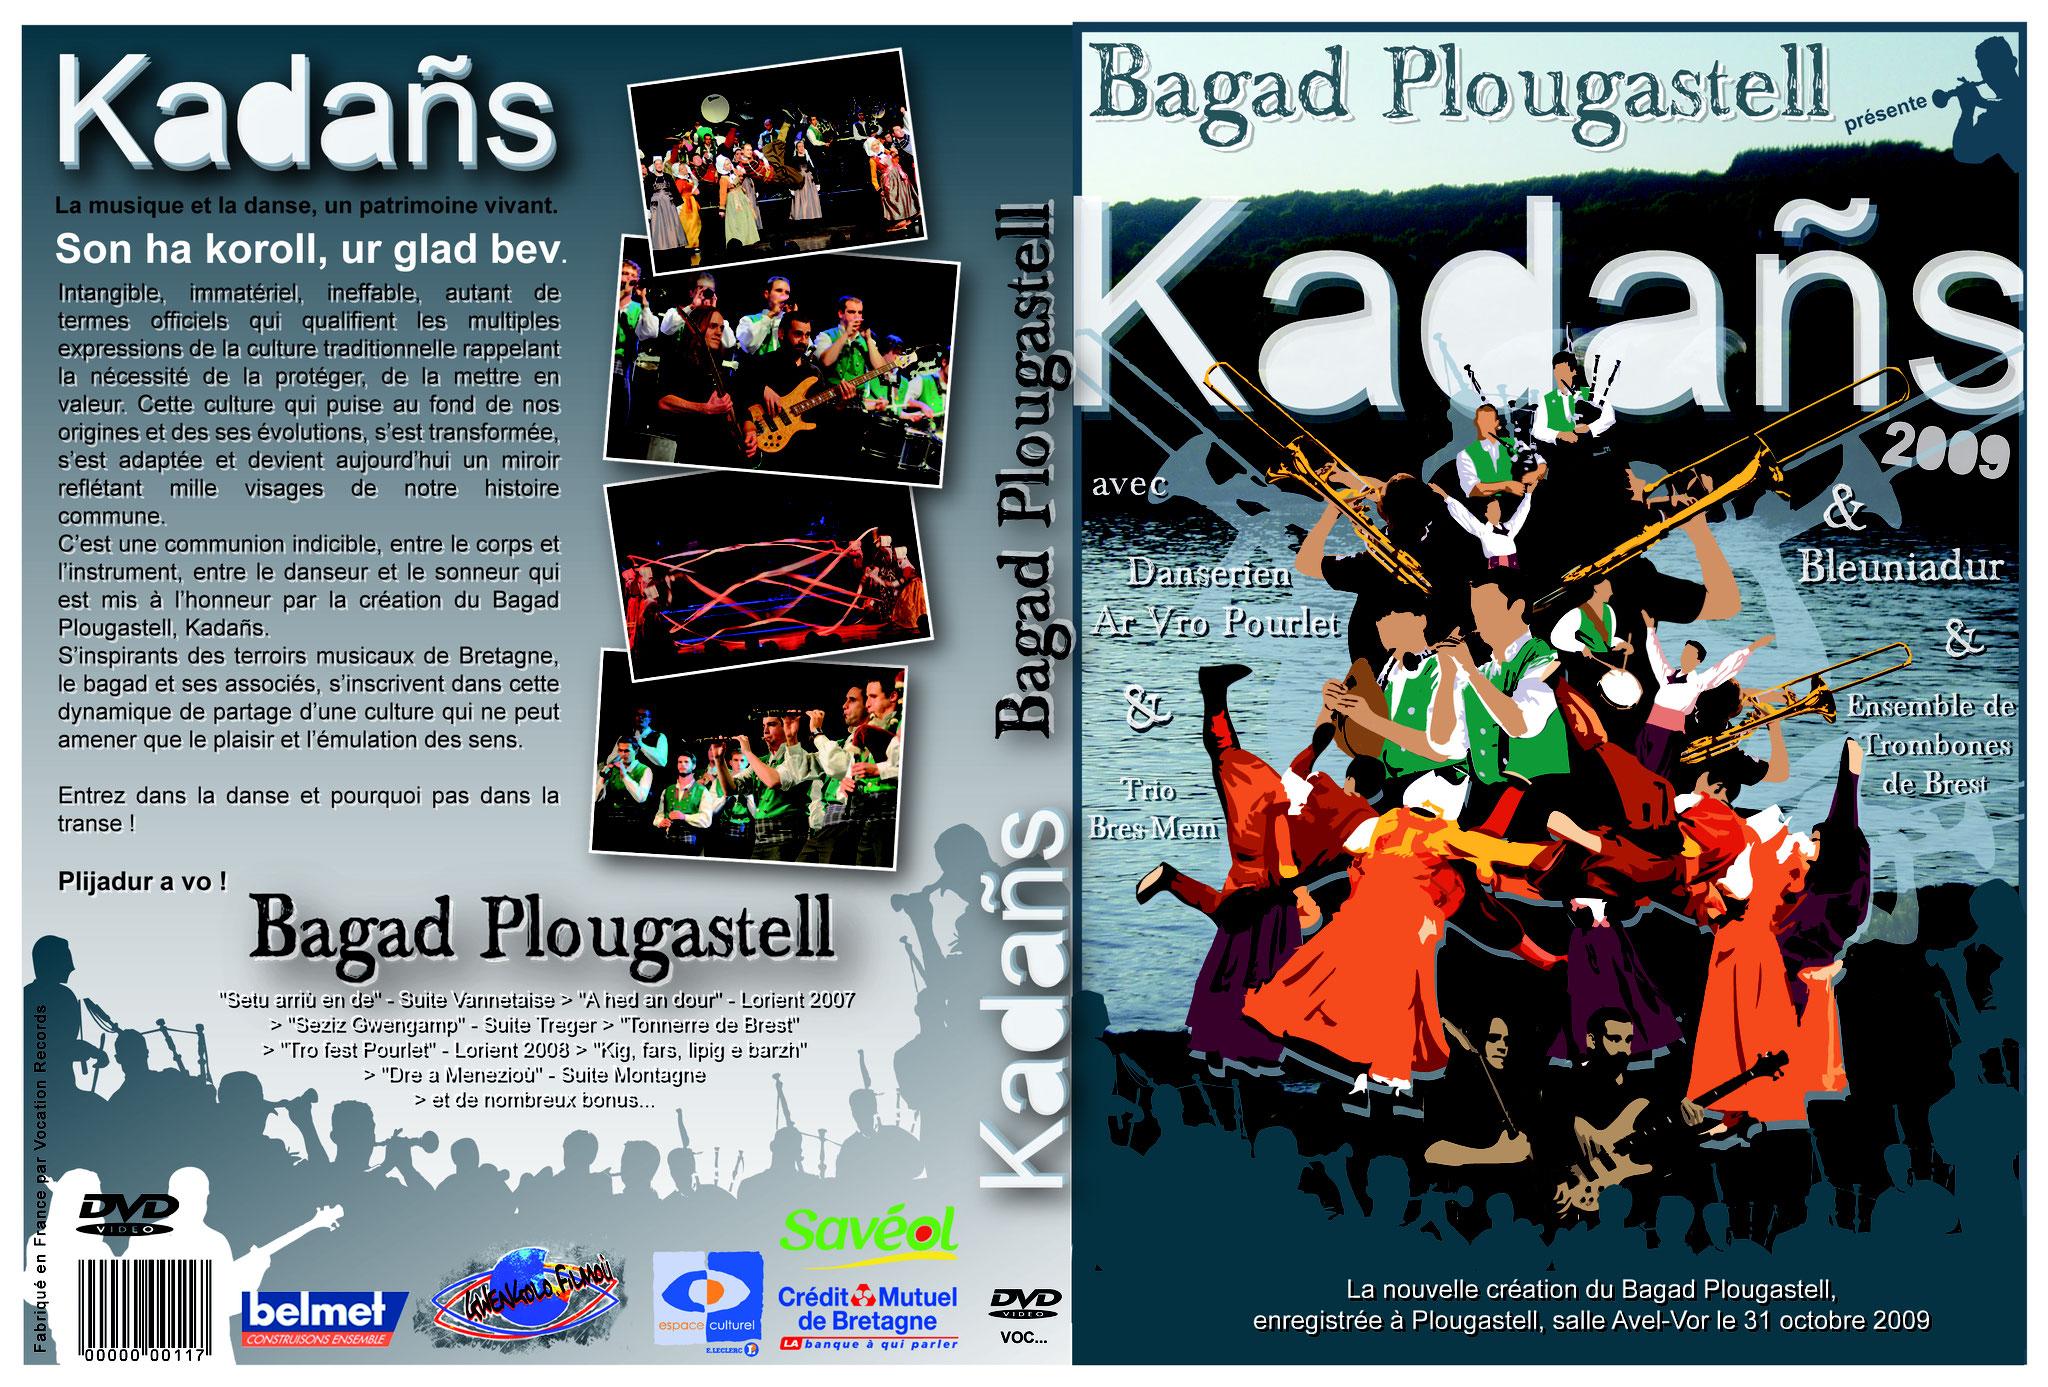 Couverure/pochette du DVD du Spectacle KADAÑS du Bagad Plougastell